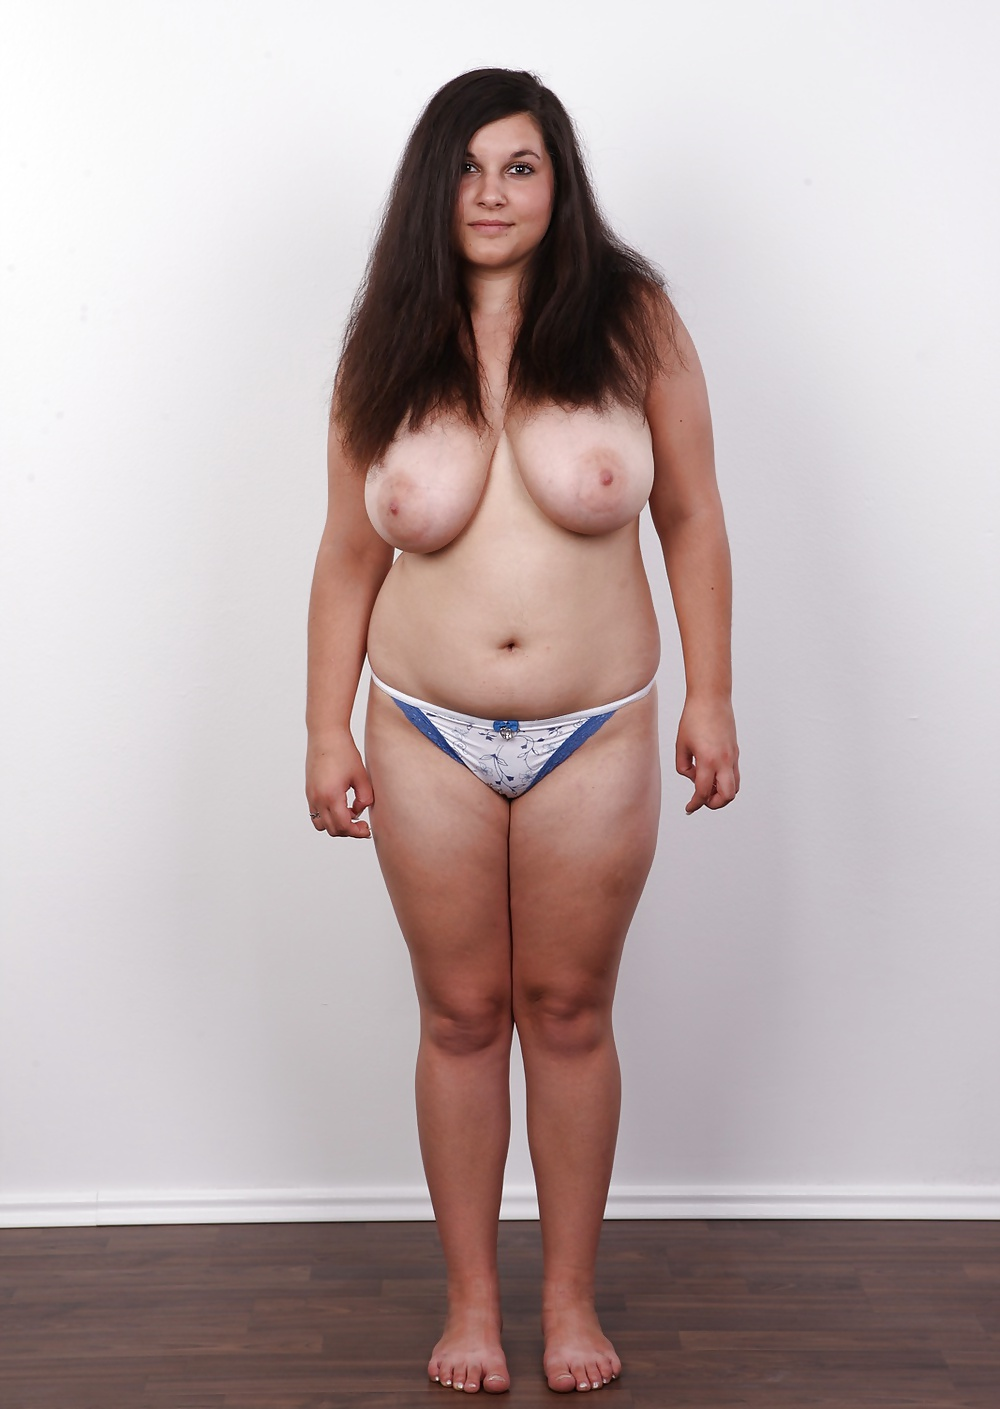 chubby-casting-vids